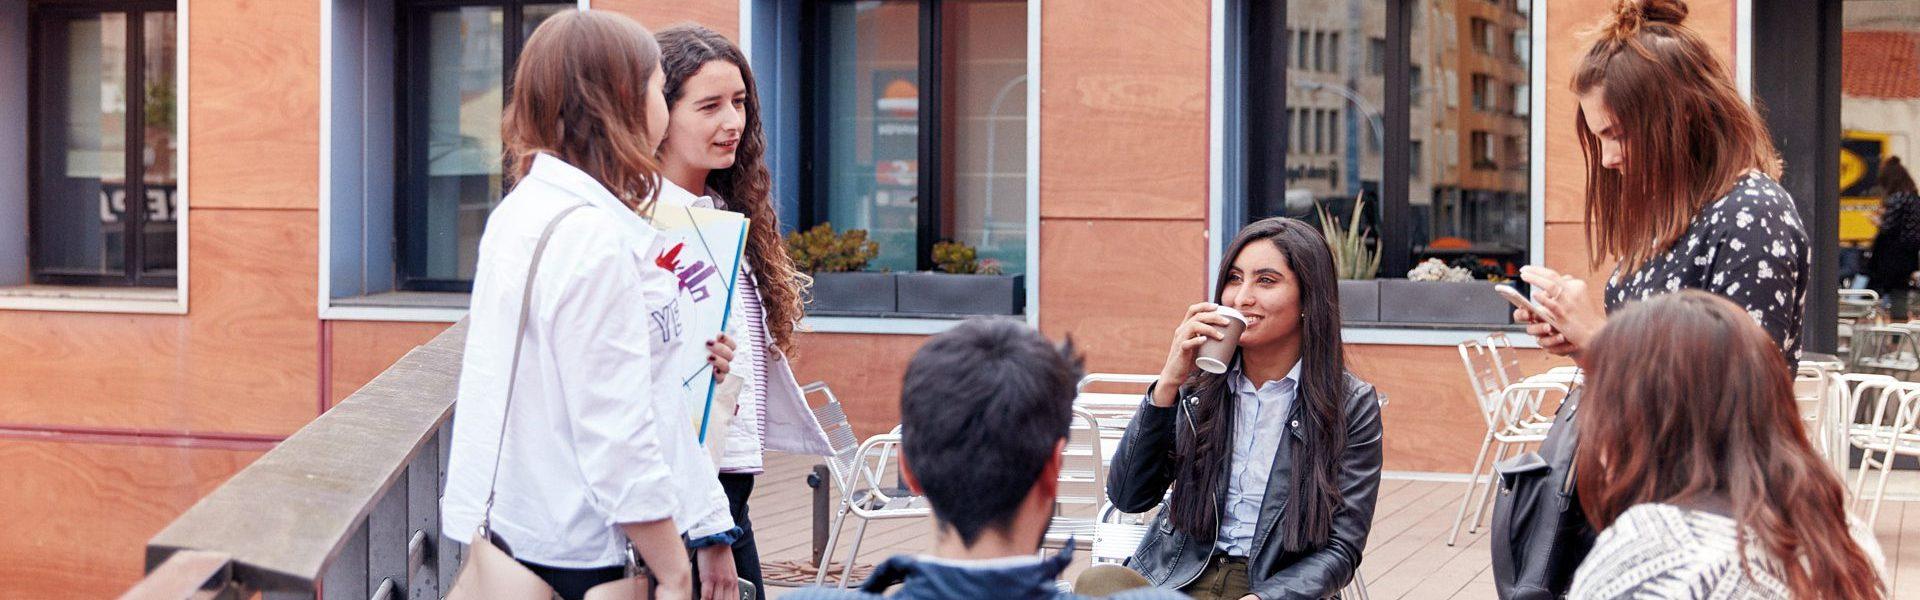 escodi-universitat-marketing-retail-terrassa